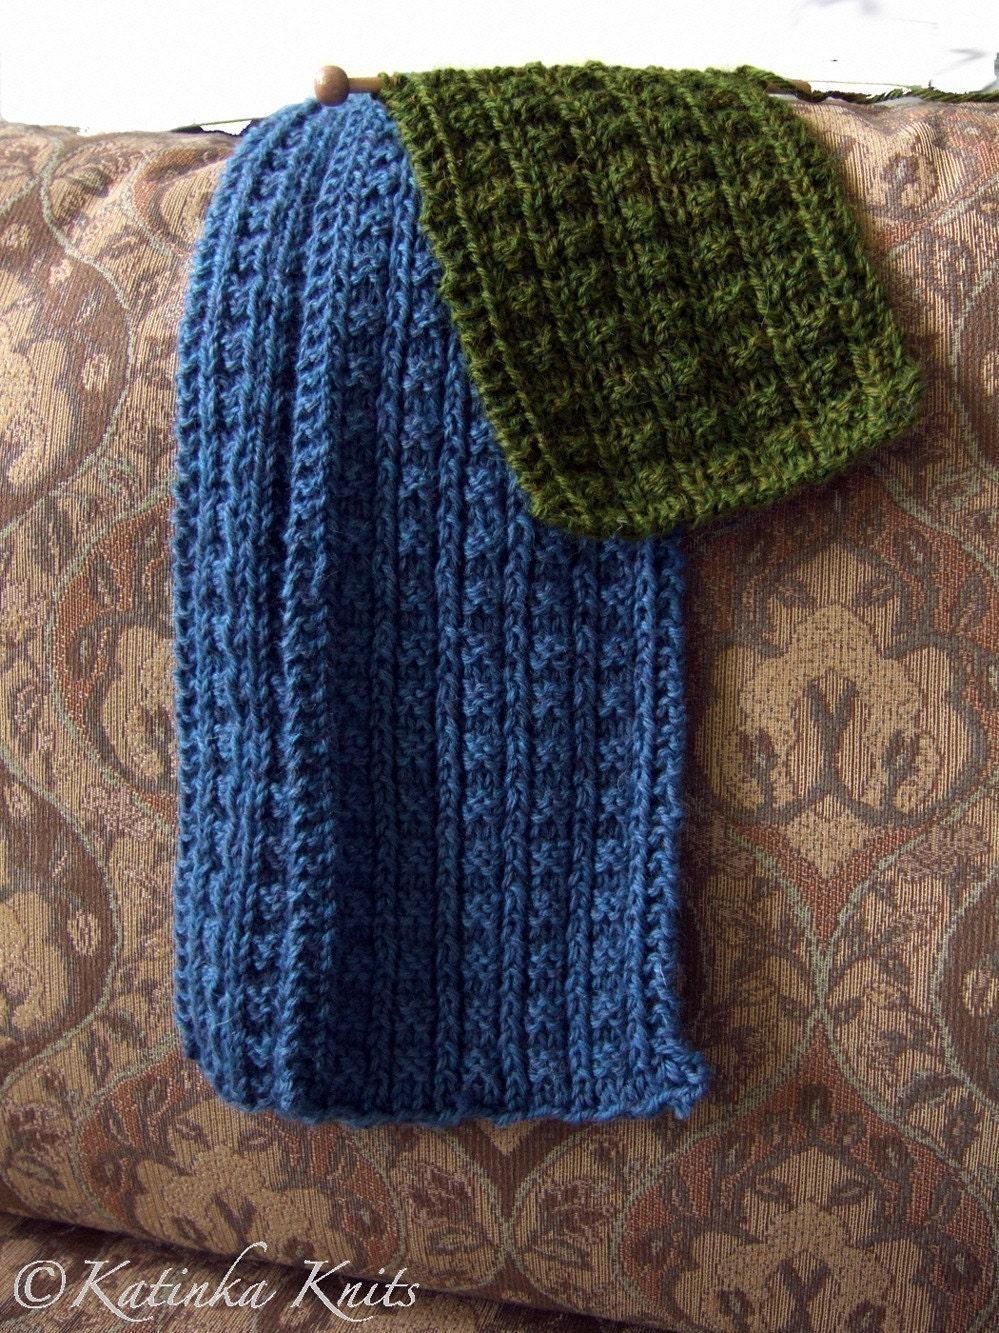 Knitting Rib Patterns   Patterns Gallery